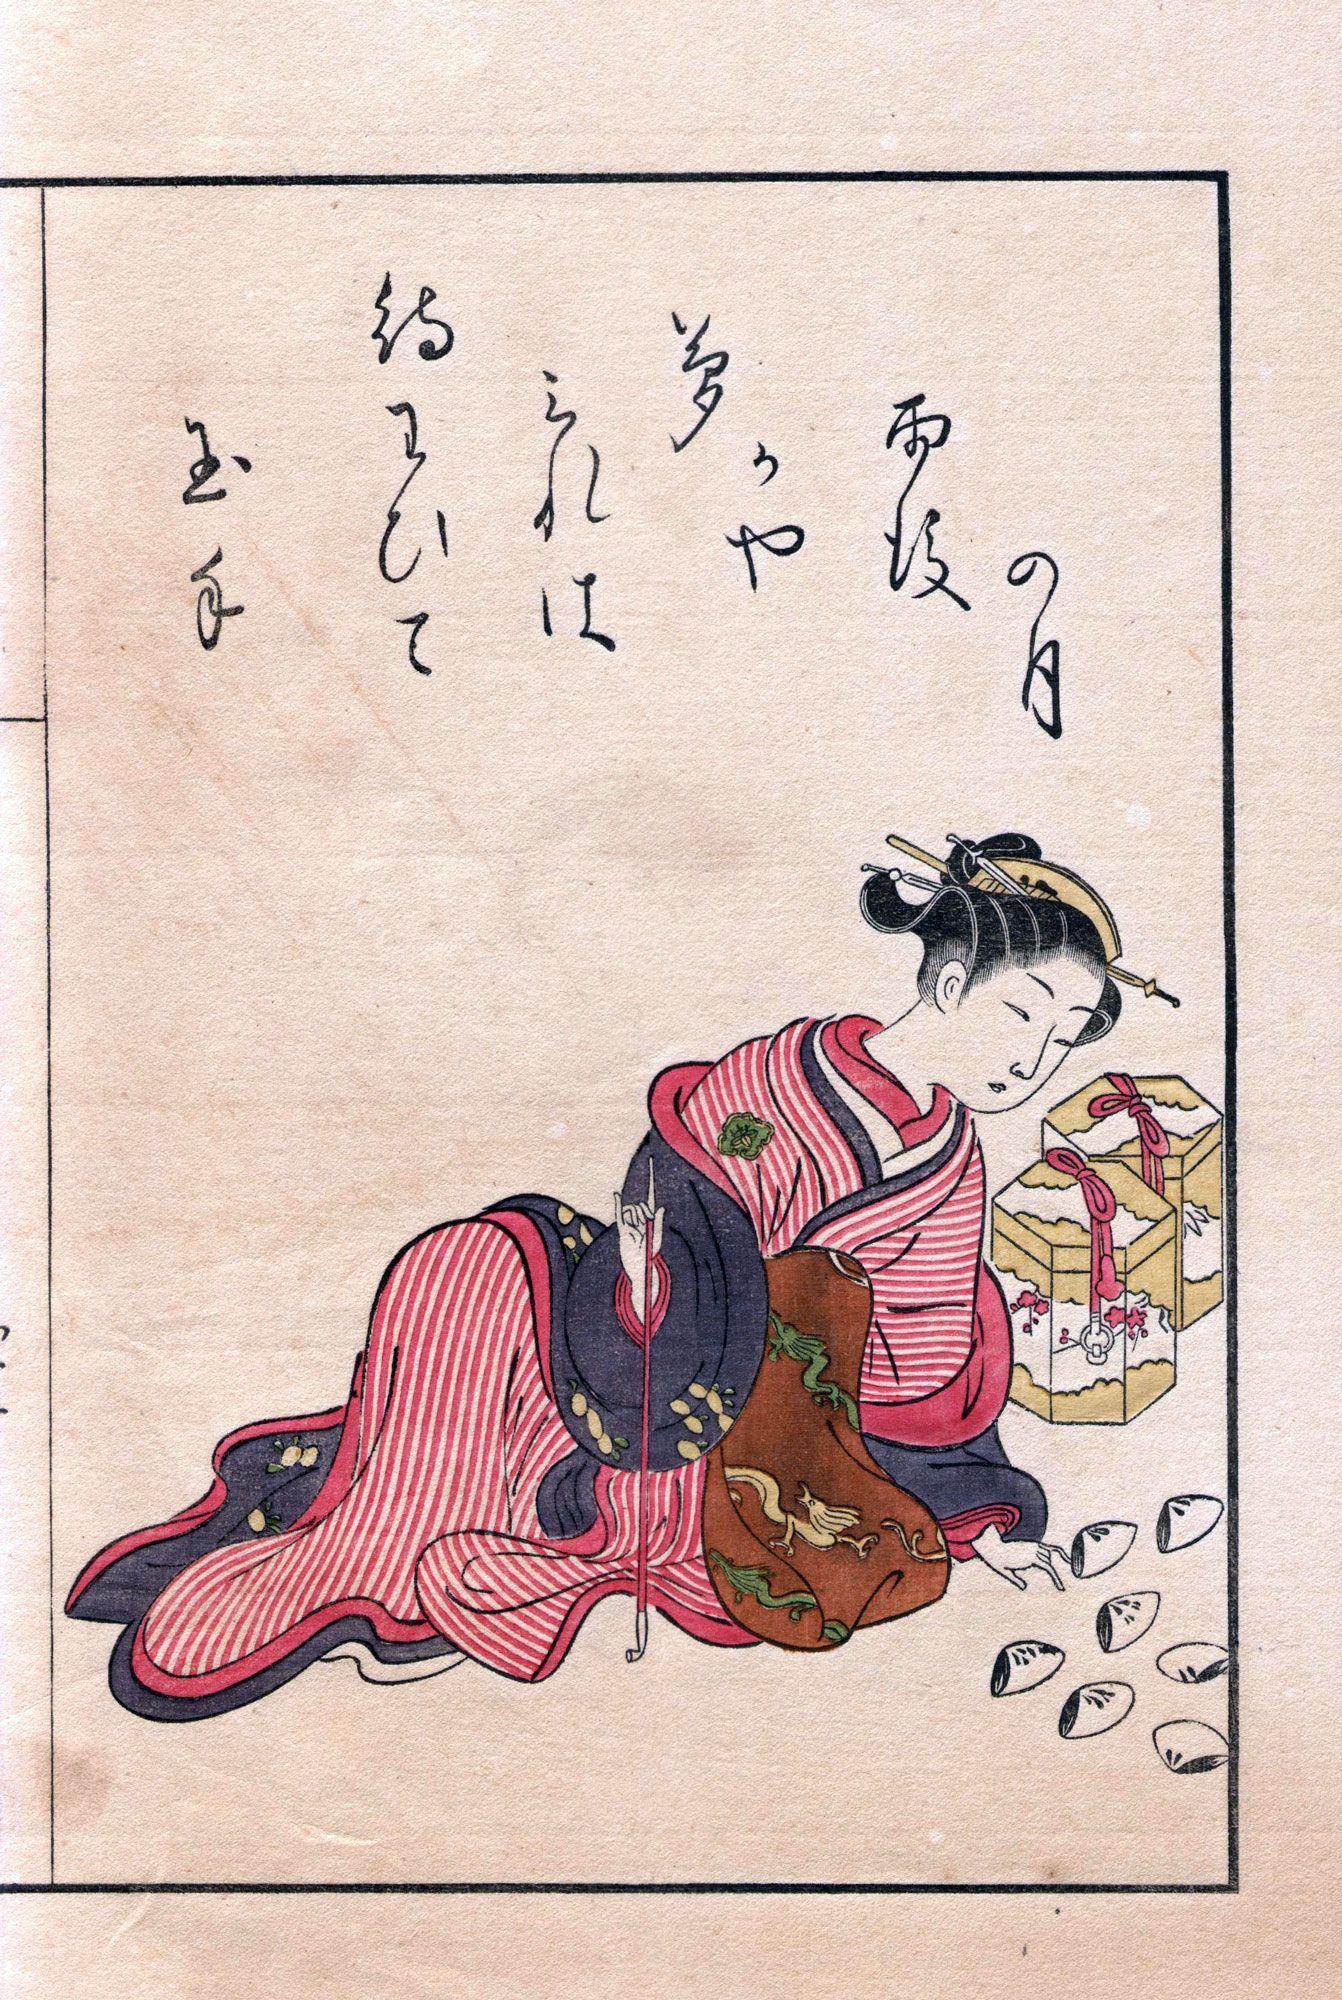 Yoshiwara bijin awase (The Beautiful Women of the Yoshiwara)1770 (Meiwa 7)Artist Suzuki Harunobu, Japanese, 1725–1770 Japanese